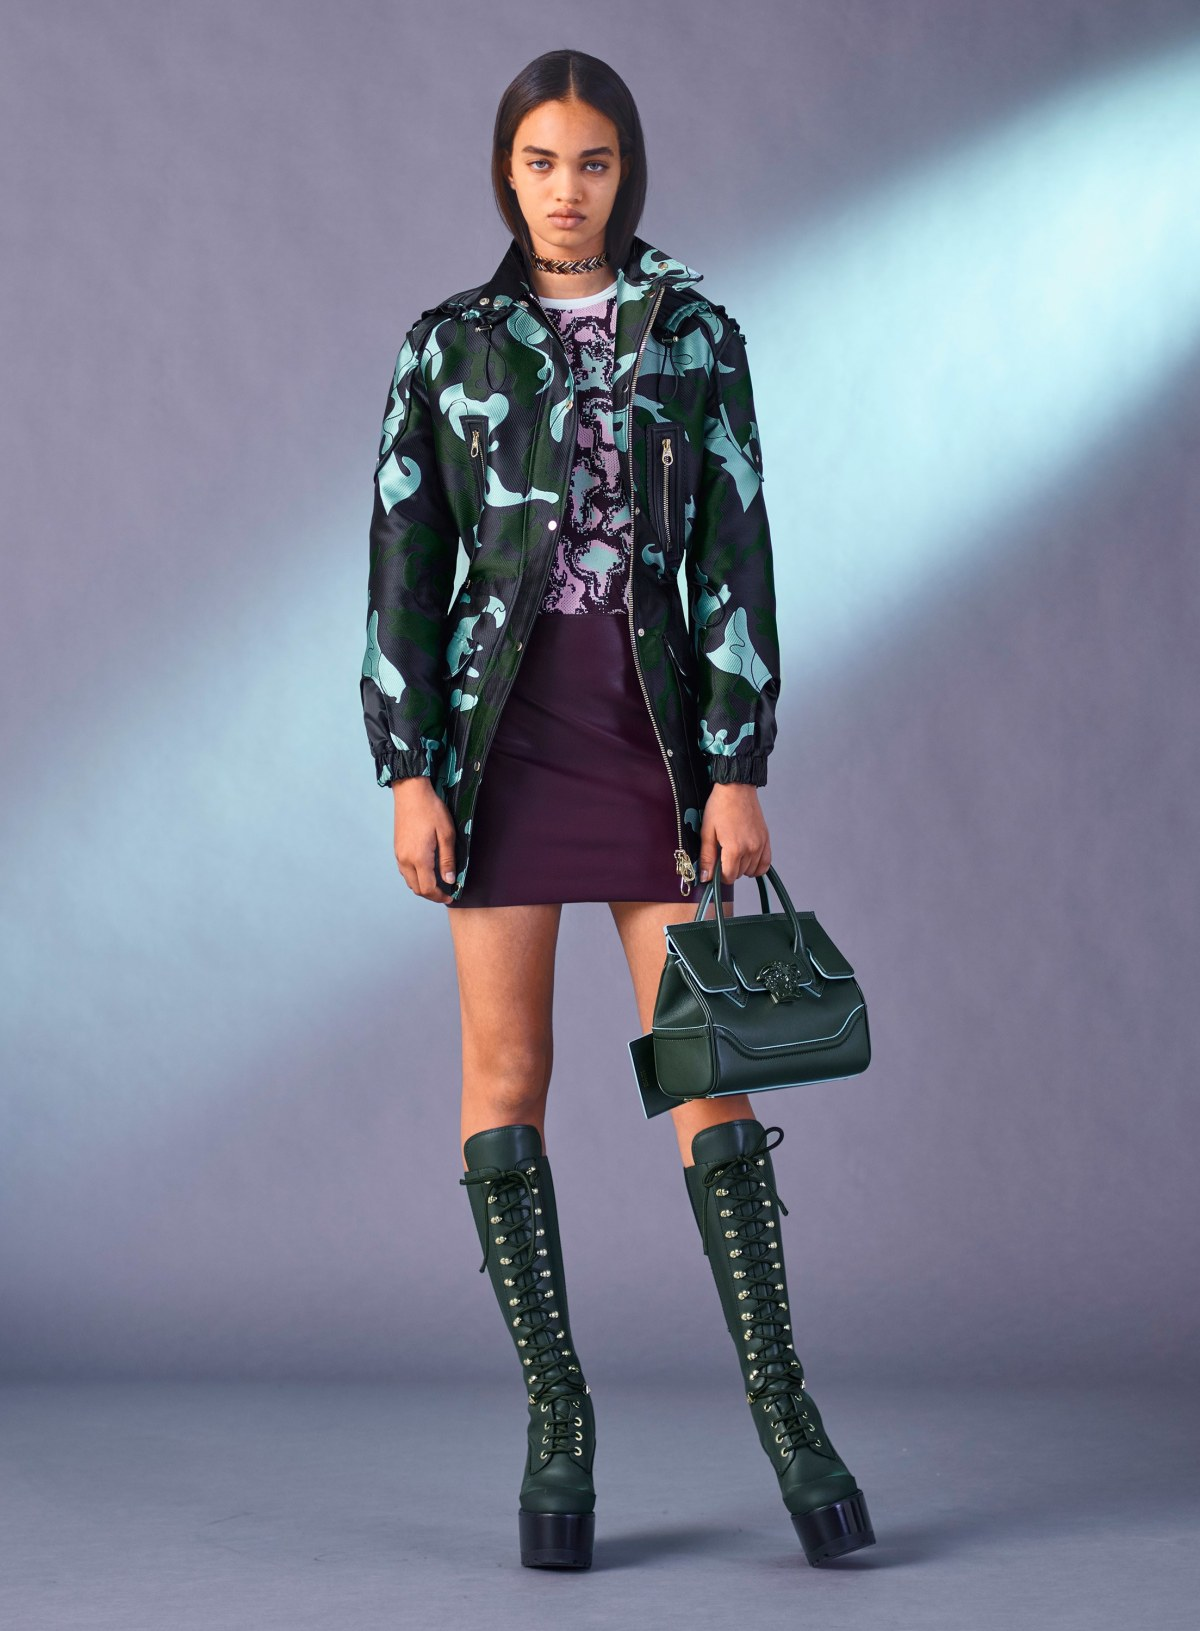 versace-pre-fall-2017-fashion-show-the-impression-09